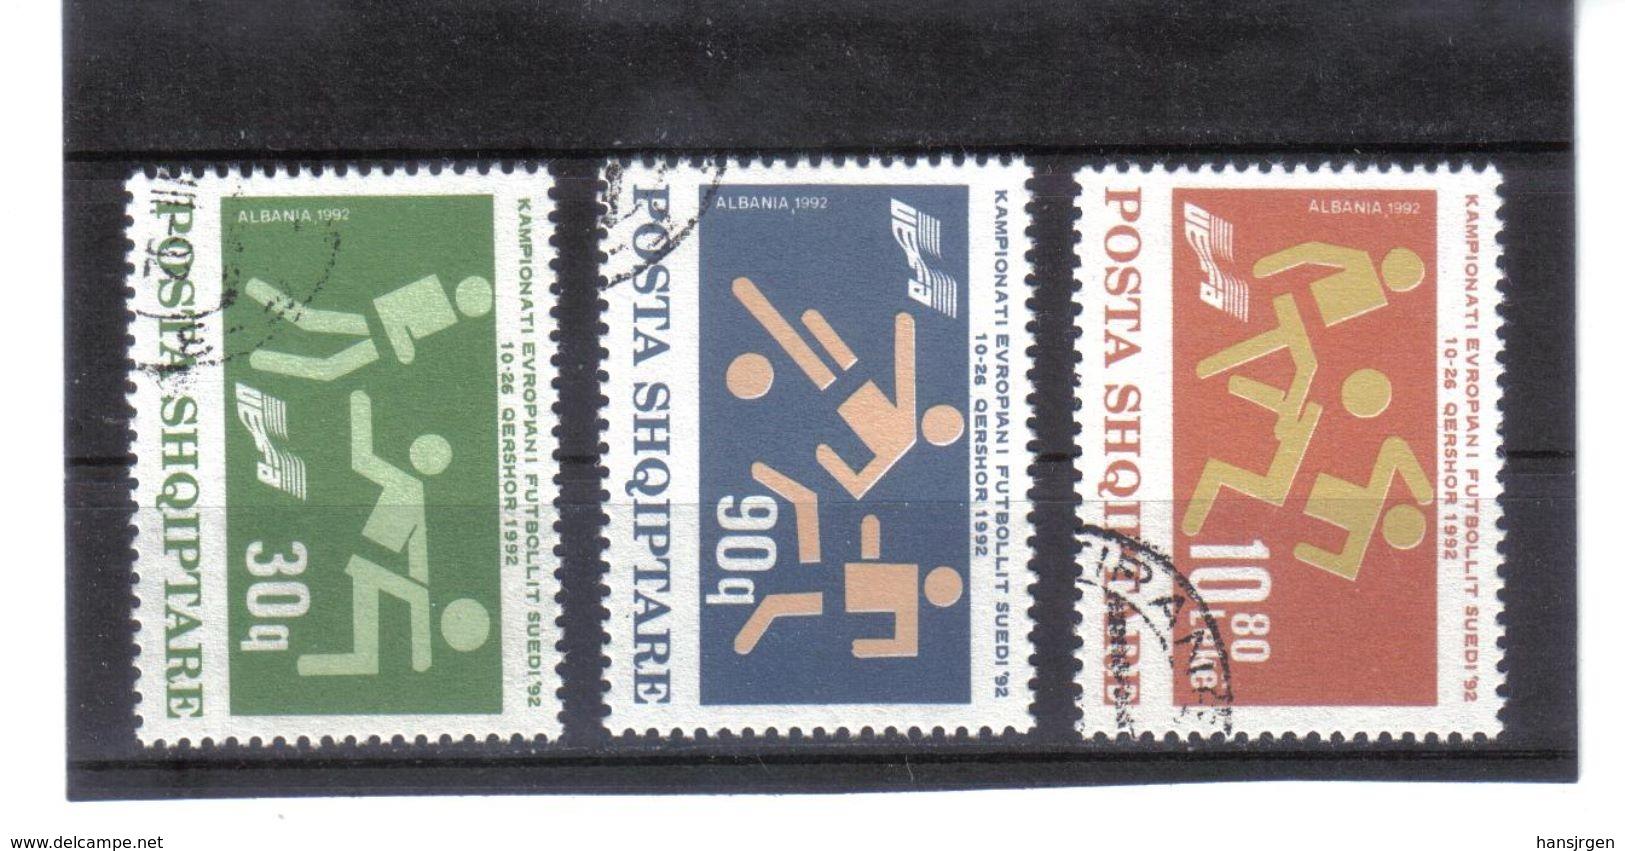 ALB166  ALBANIEN 1992  MICHL  2499/01  Used / Gestempelt SIEHE ABBILDUNG - Albania